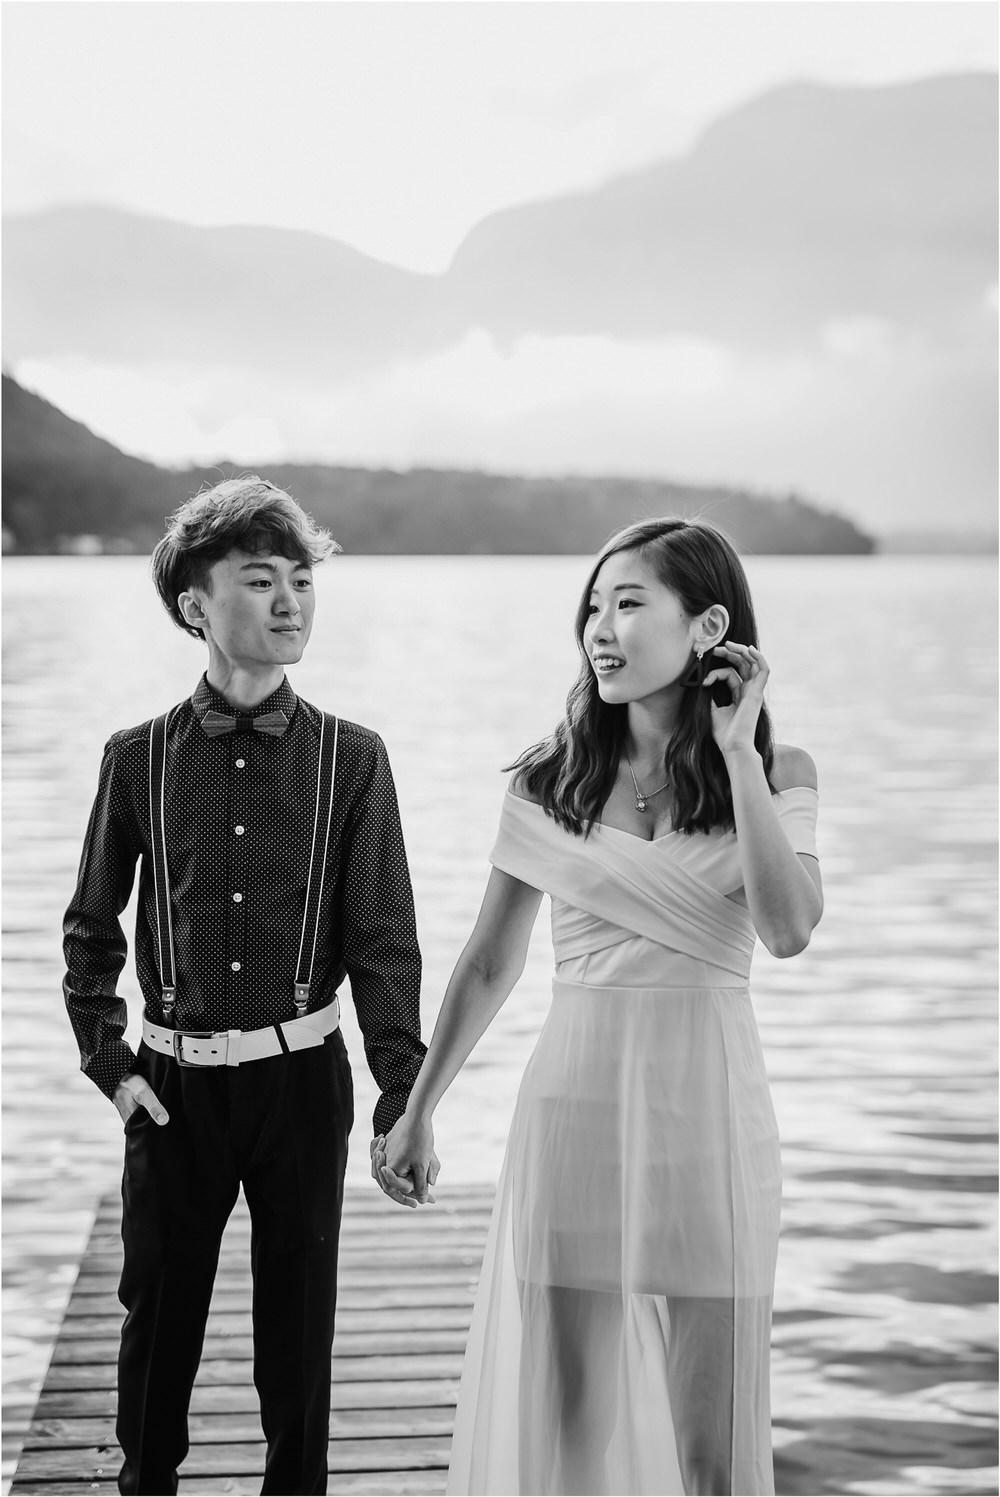 hallstatt austria wedding engagement photographer asian proposal surprise photography recommended nature professional 0026.jpg